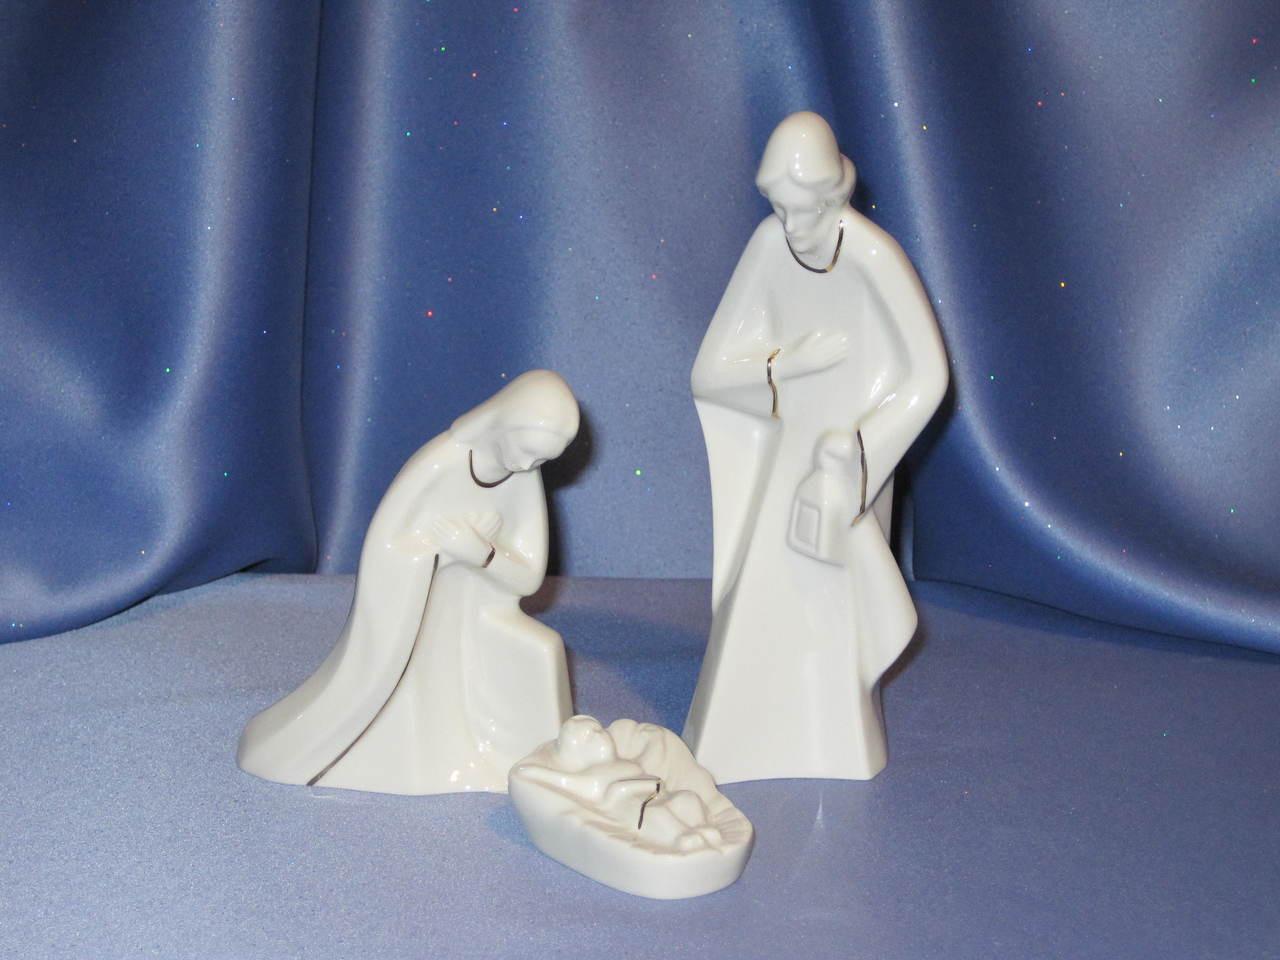 Holy Night Nativity - Mary and Joseph with baby Jesus b